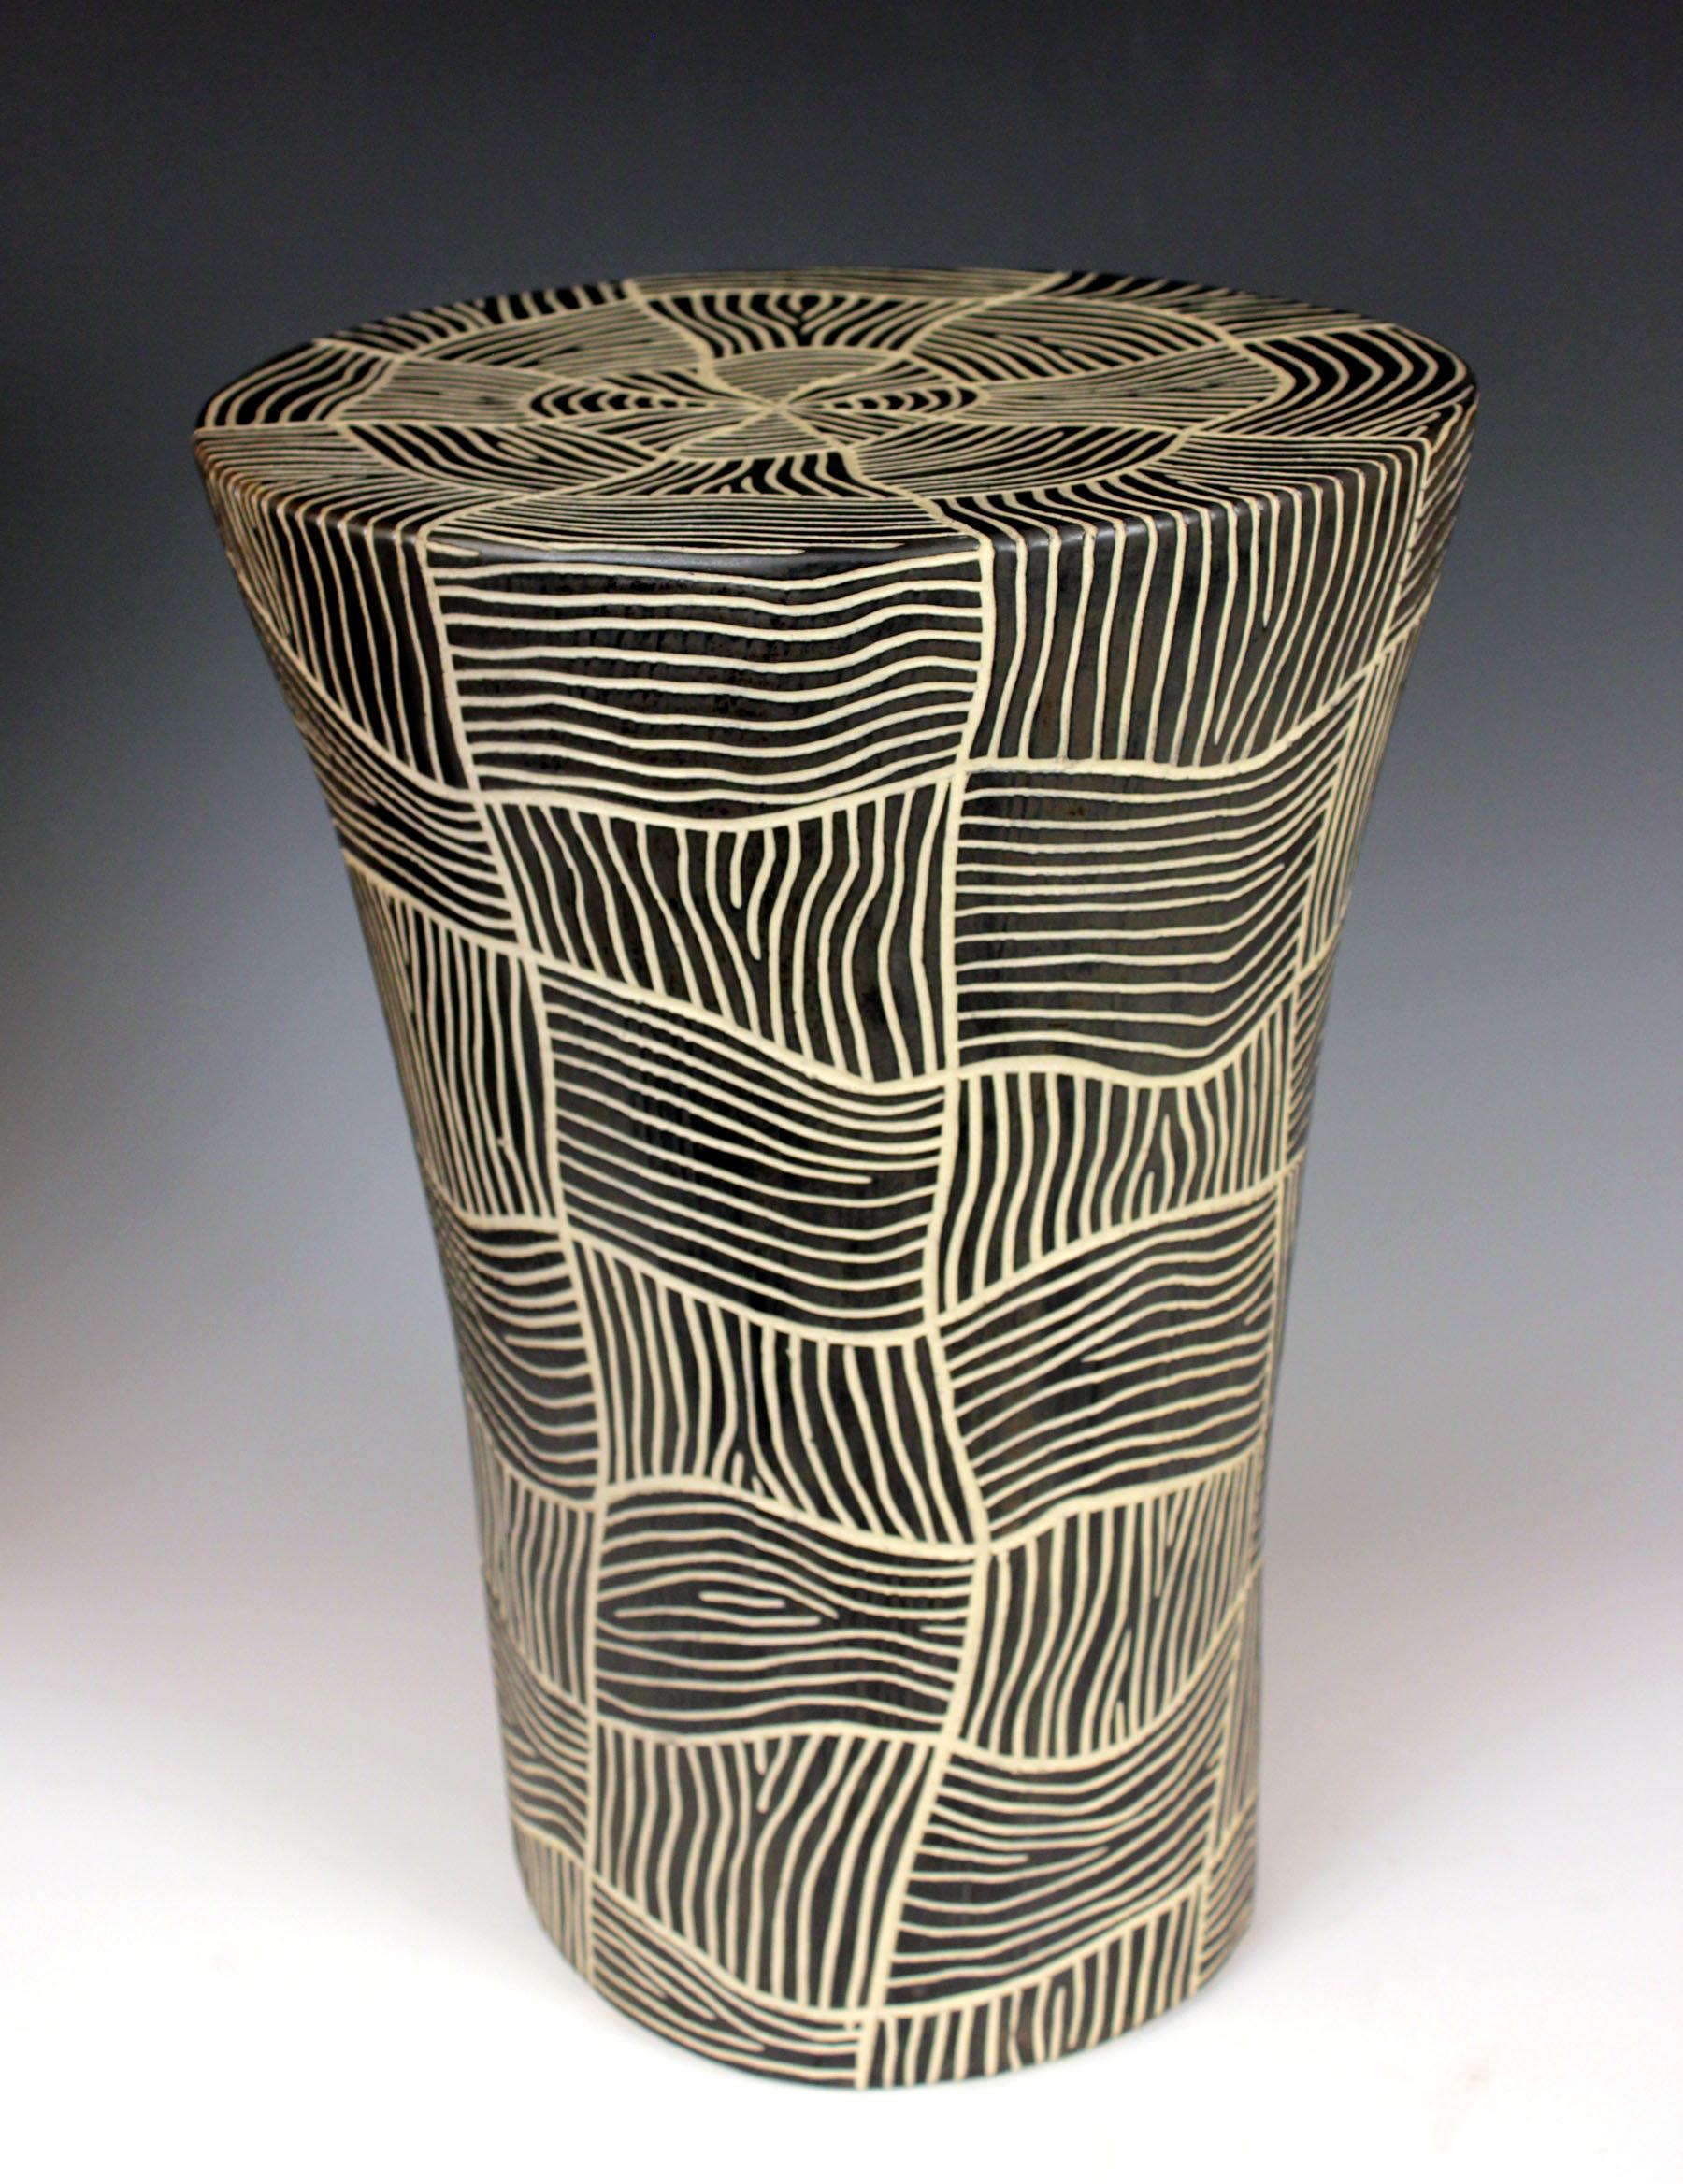 Woven Round Table by Larry Halvorsen. Hand-built stoneware end table on names of vases, wooden vases, kitchen vases, bulk mini vases, colored vases, vintage vases, bowl vases, handmade vases, traditional vases, engraved vases, sticks painted vases, yellow vases, big vases, carved vases, frost vases, mirror vases, art vases, engravable vases, decorative vases, gold vases,